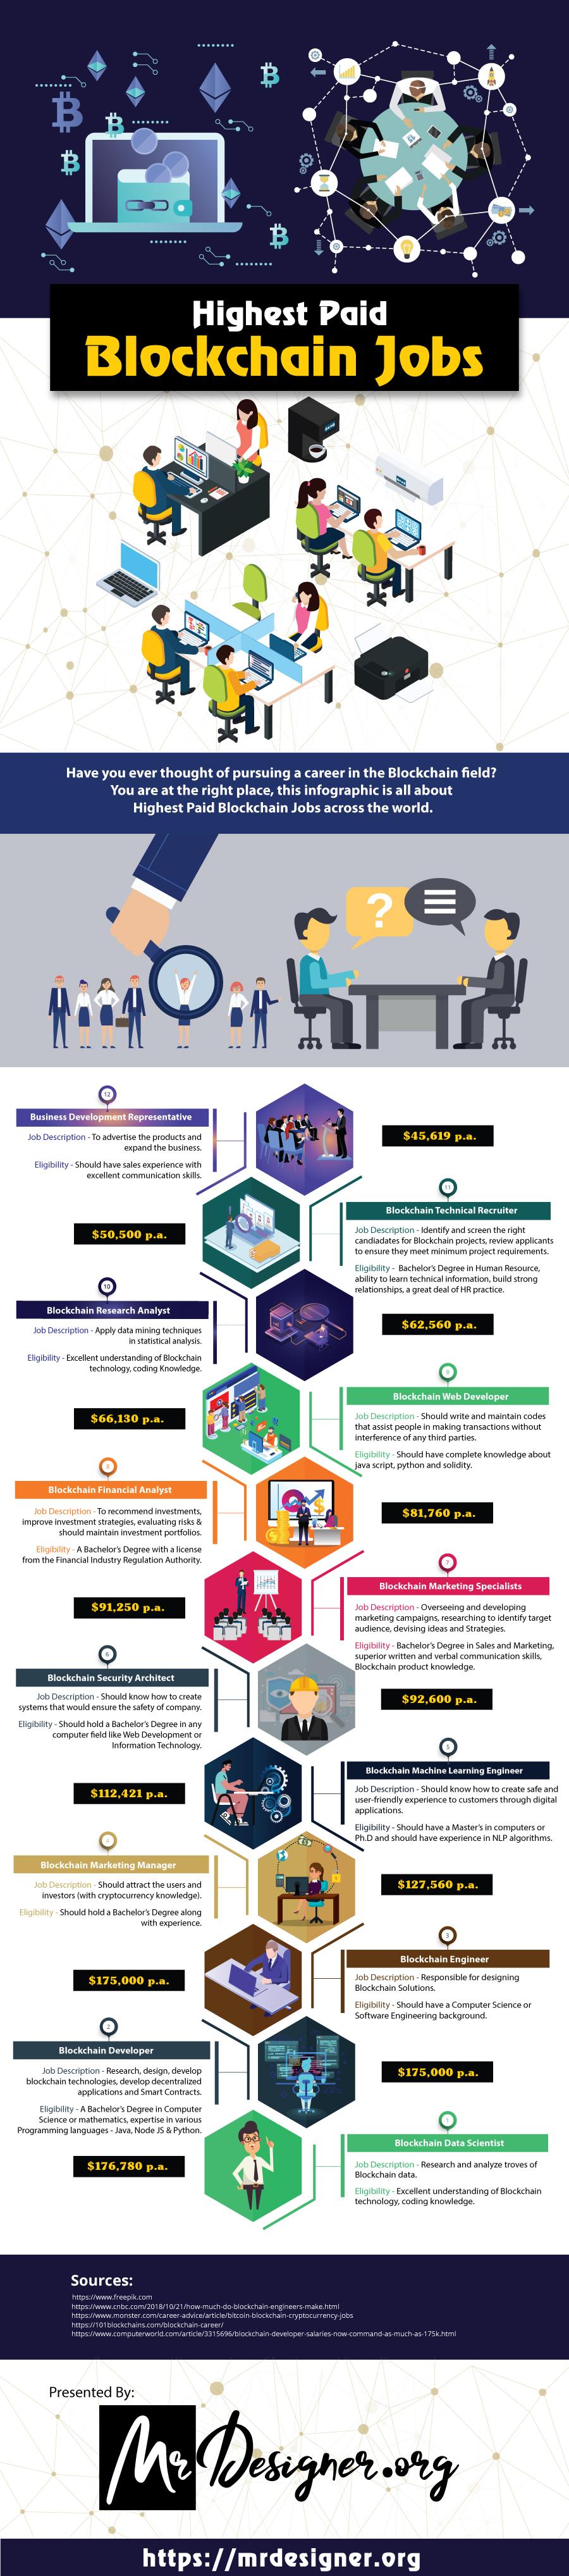 Highest Paid Blockchain Jobs - Infographic